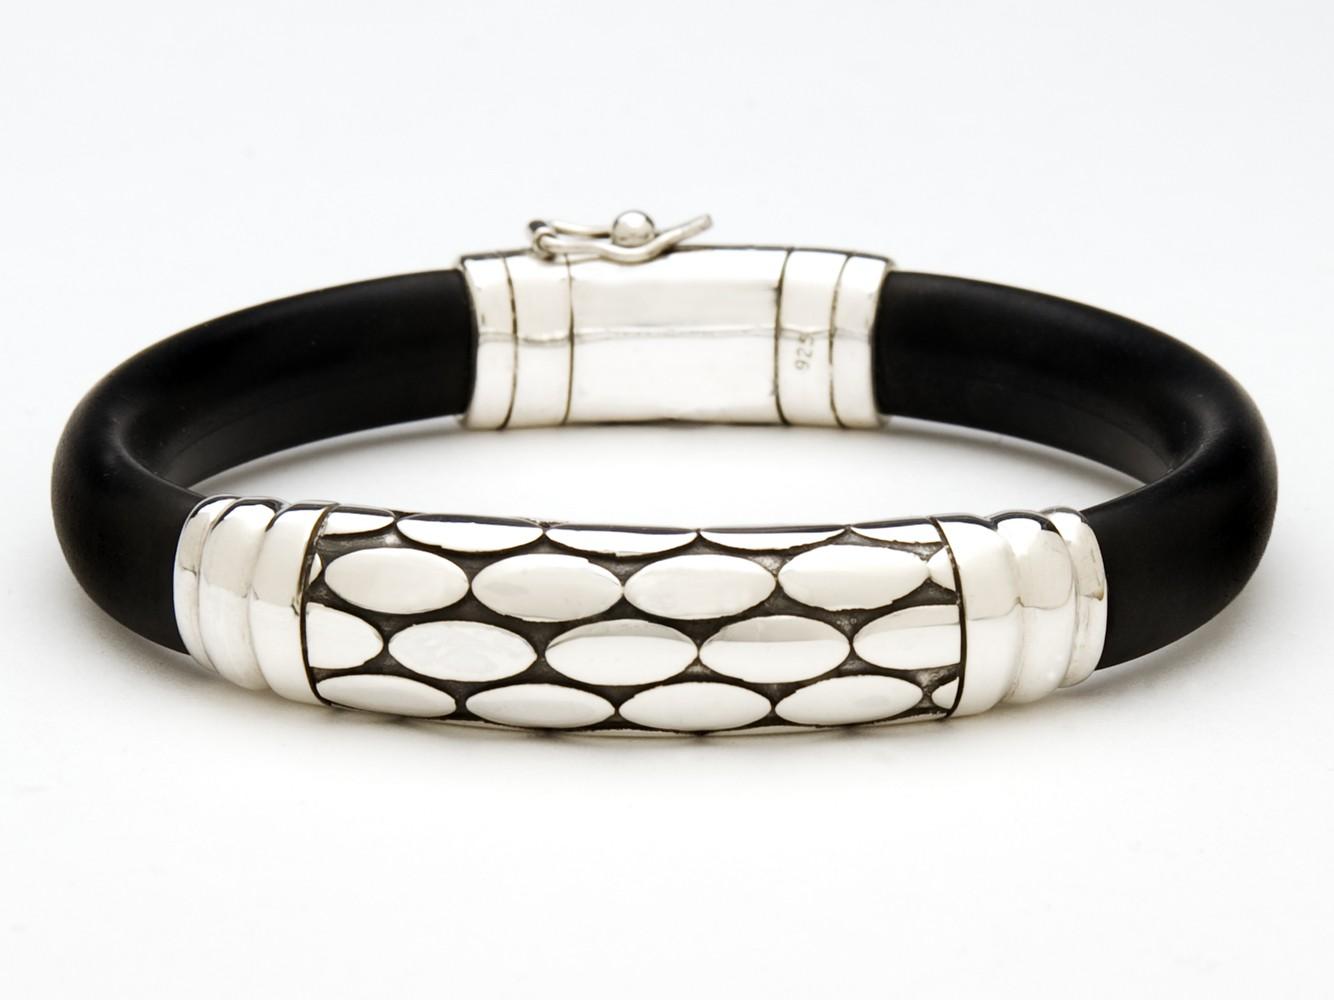 Black Rubber and Sterling Silver Bracelet